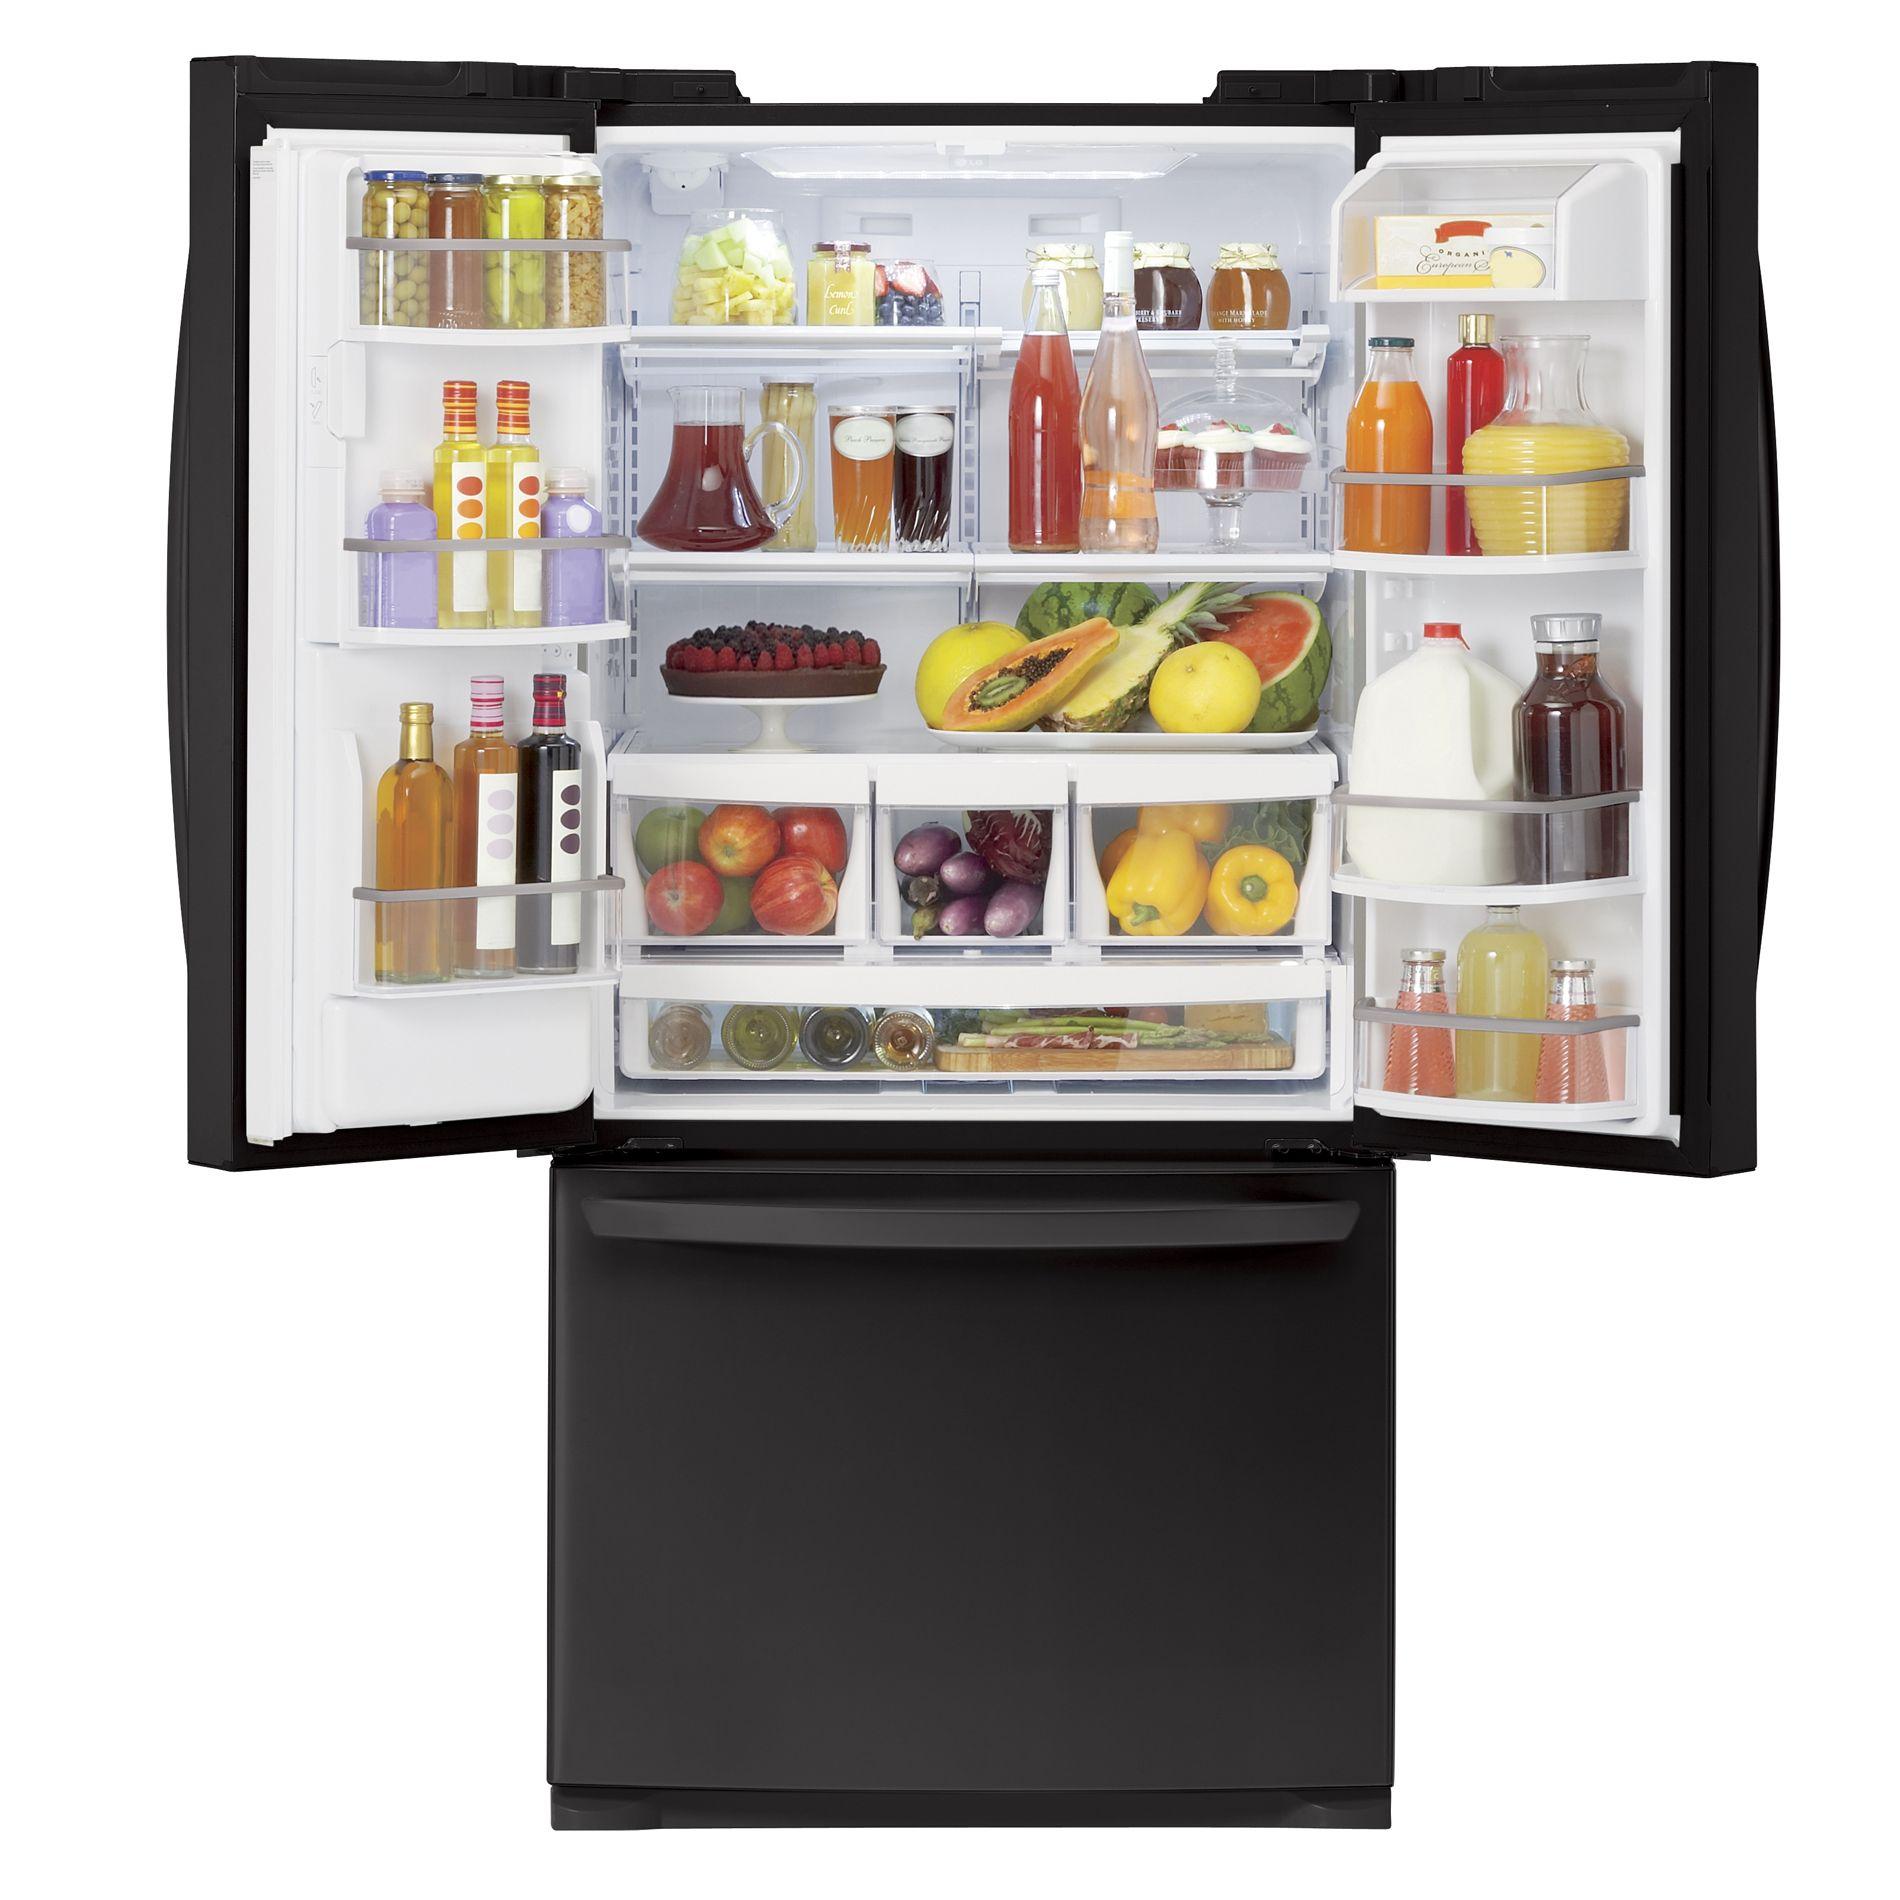 LG 25.0 cu. ft.  French Door Bottom-Freezer Refrigerator